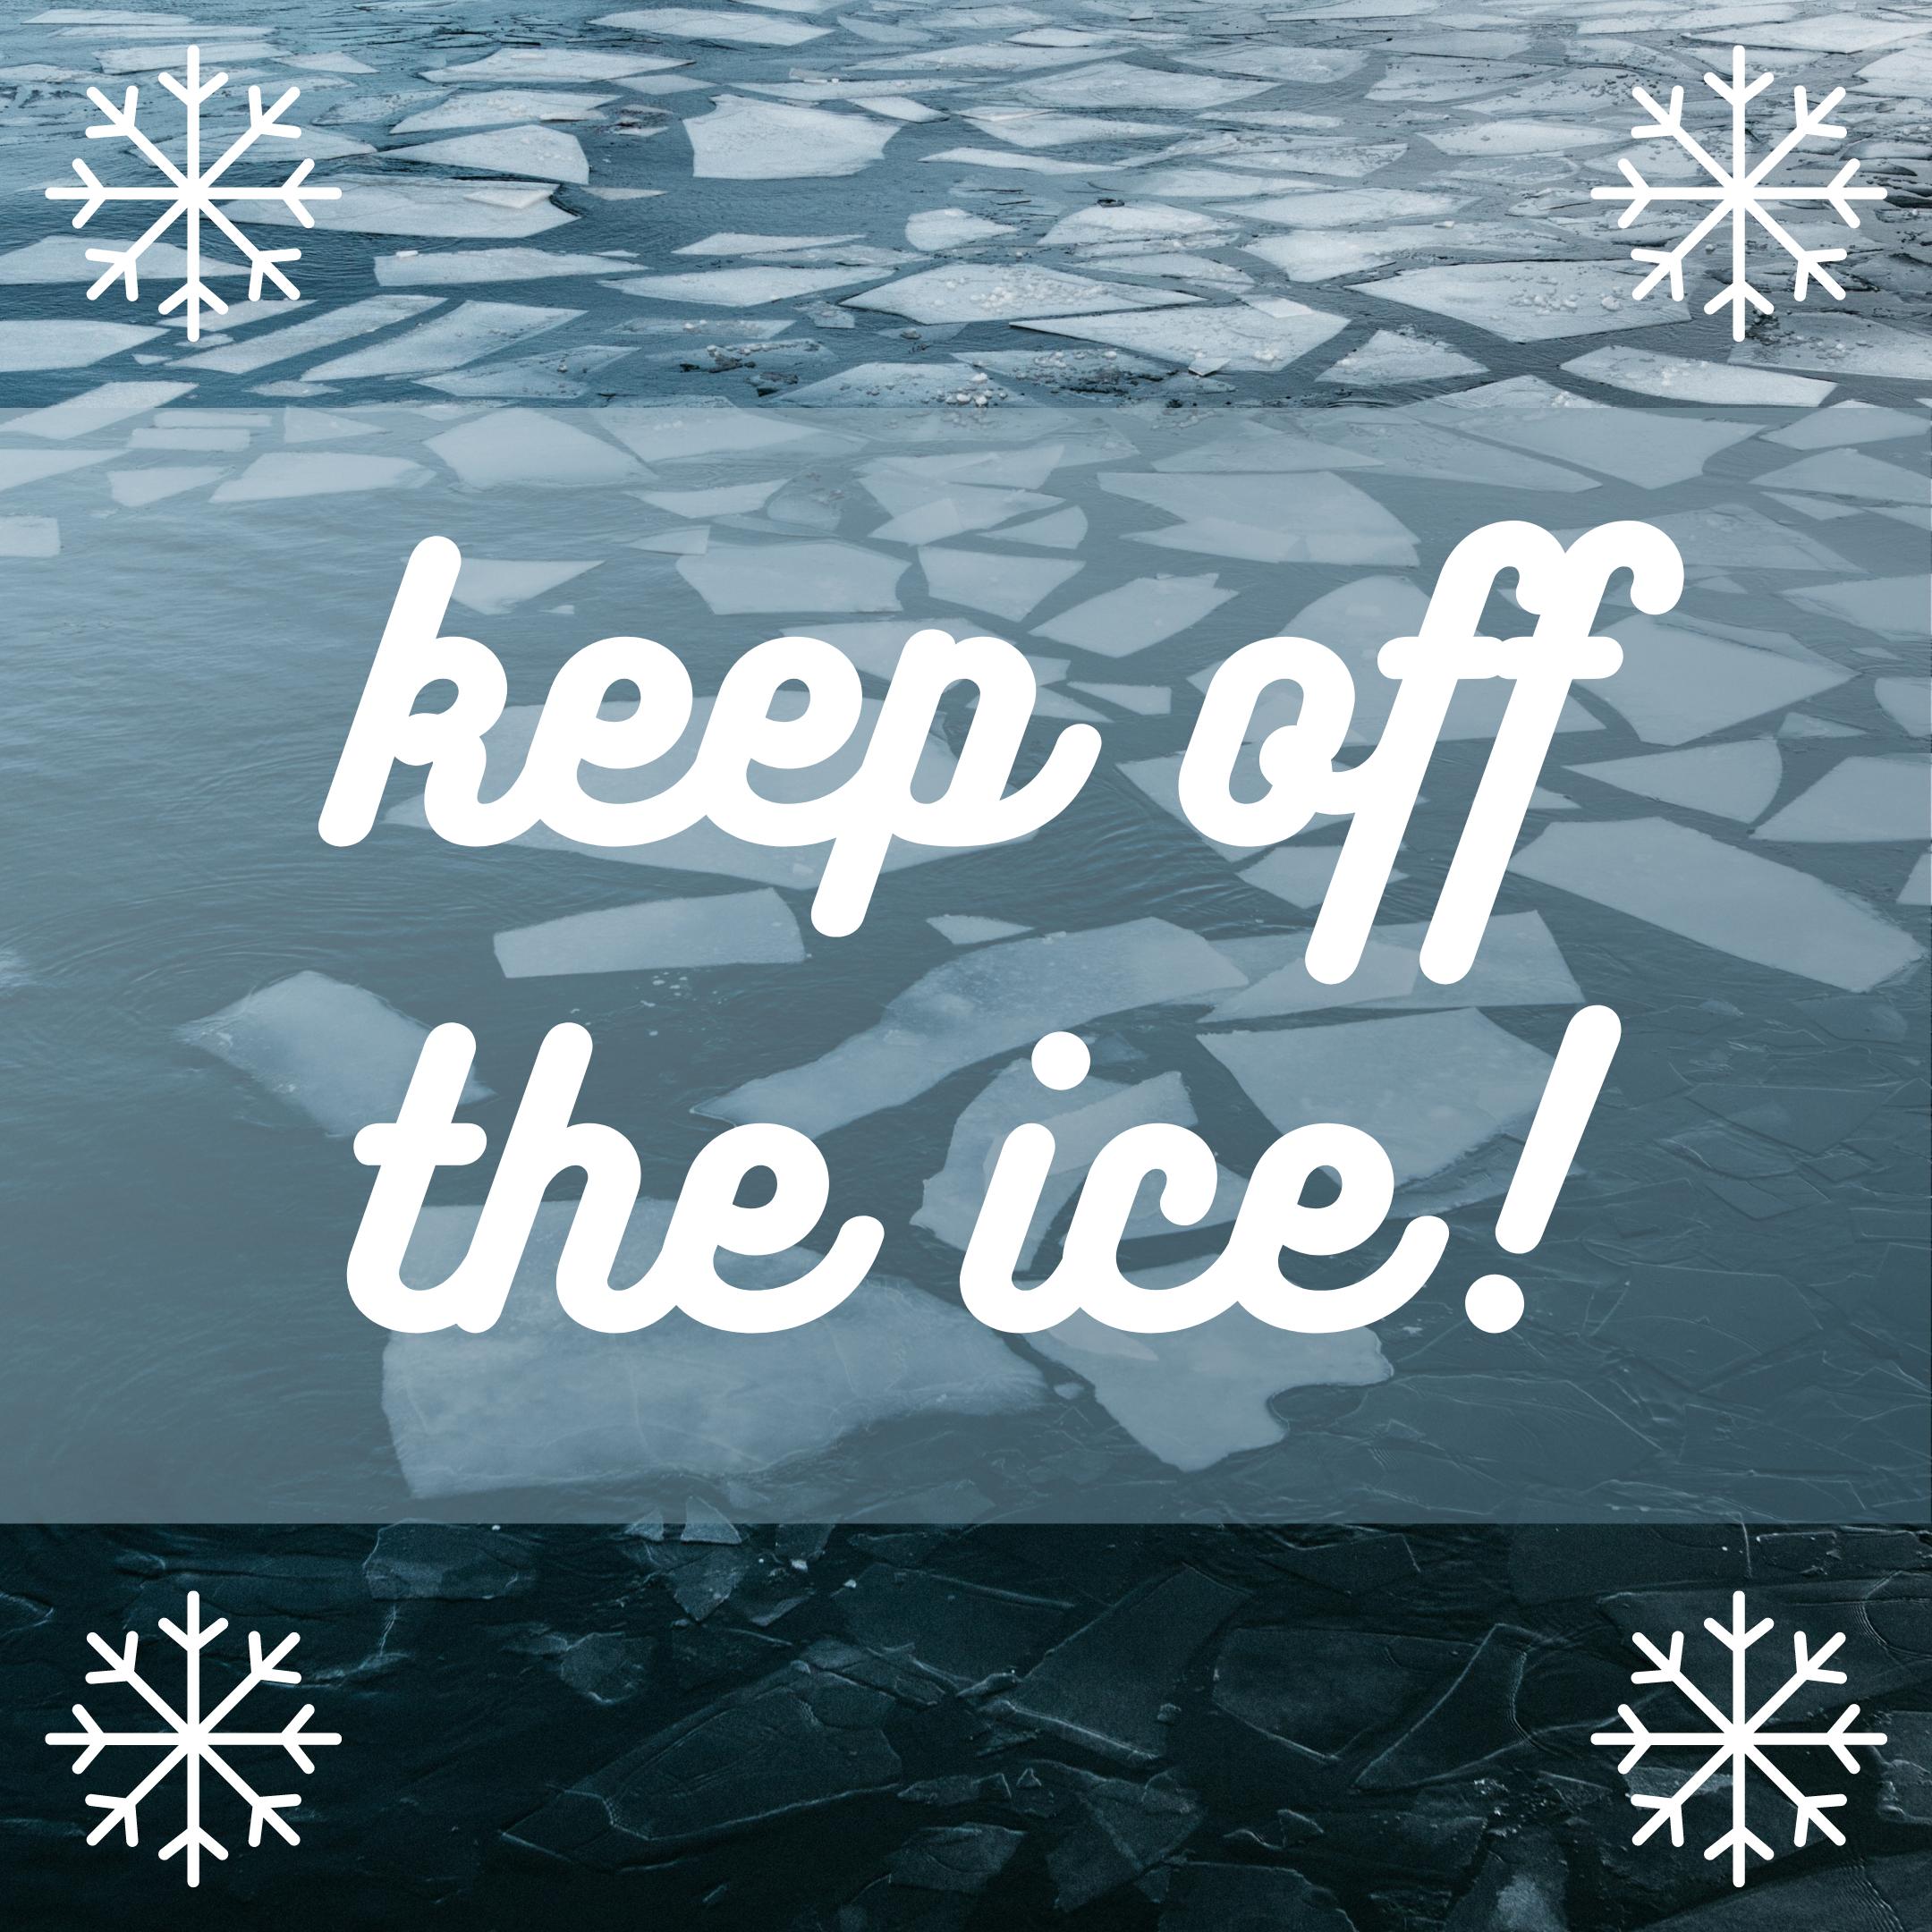 Keep off the Ice - Image 1